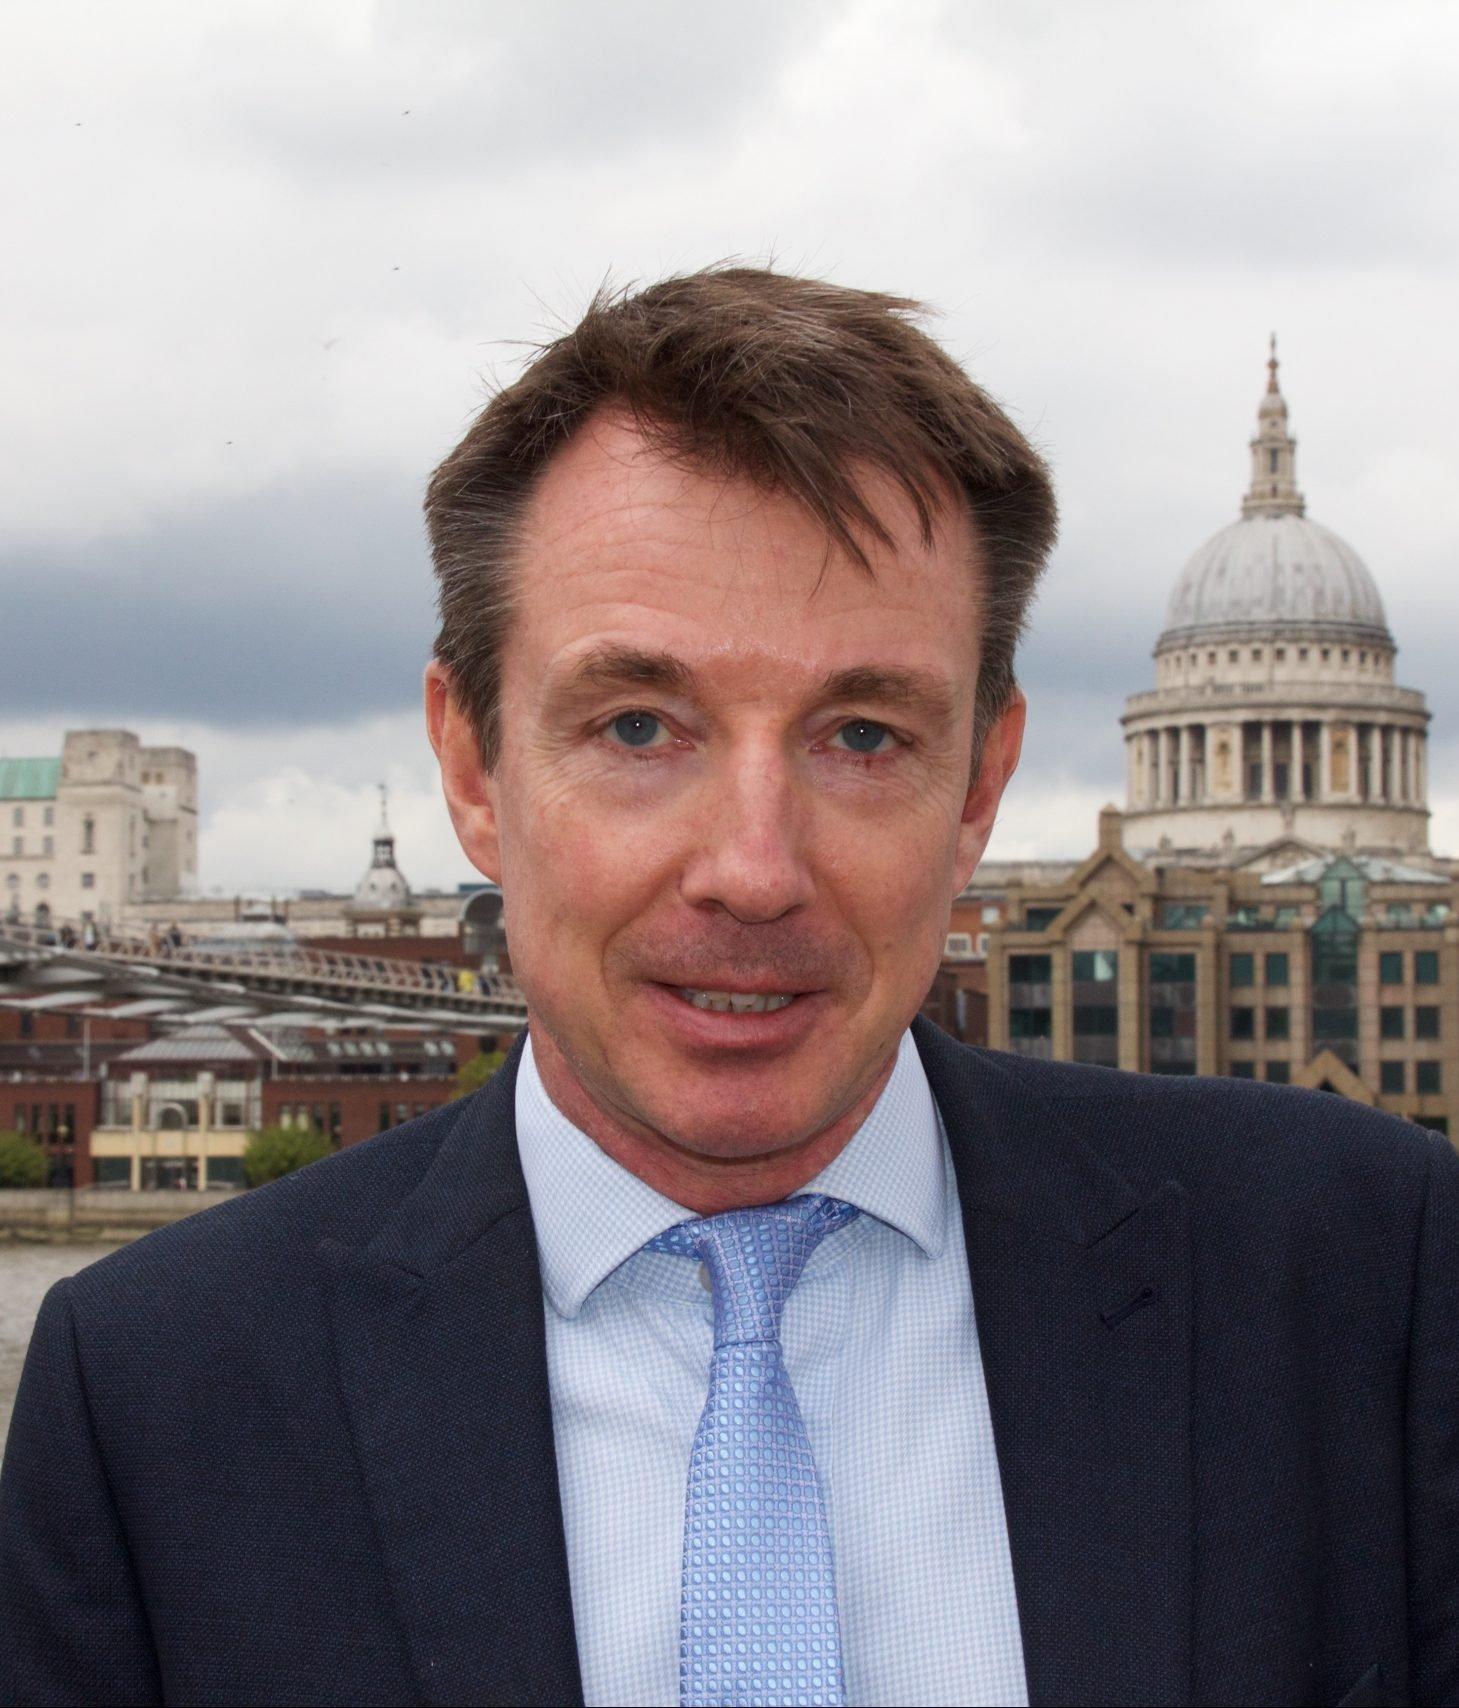 Mark Brolin in London